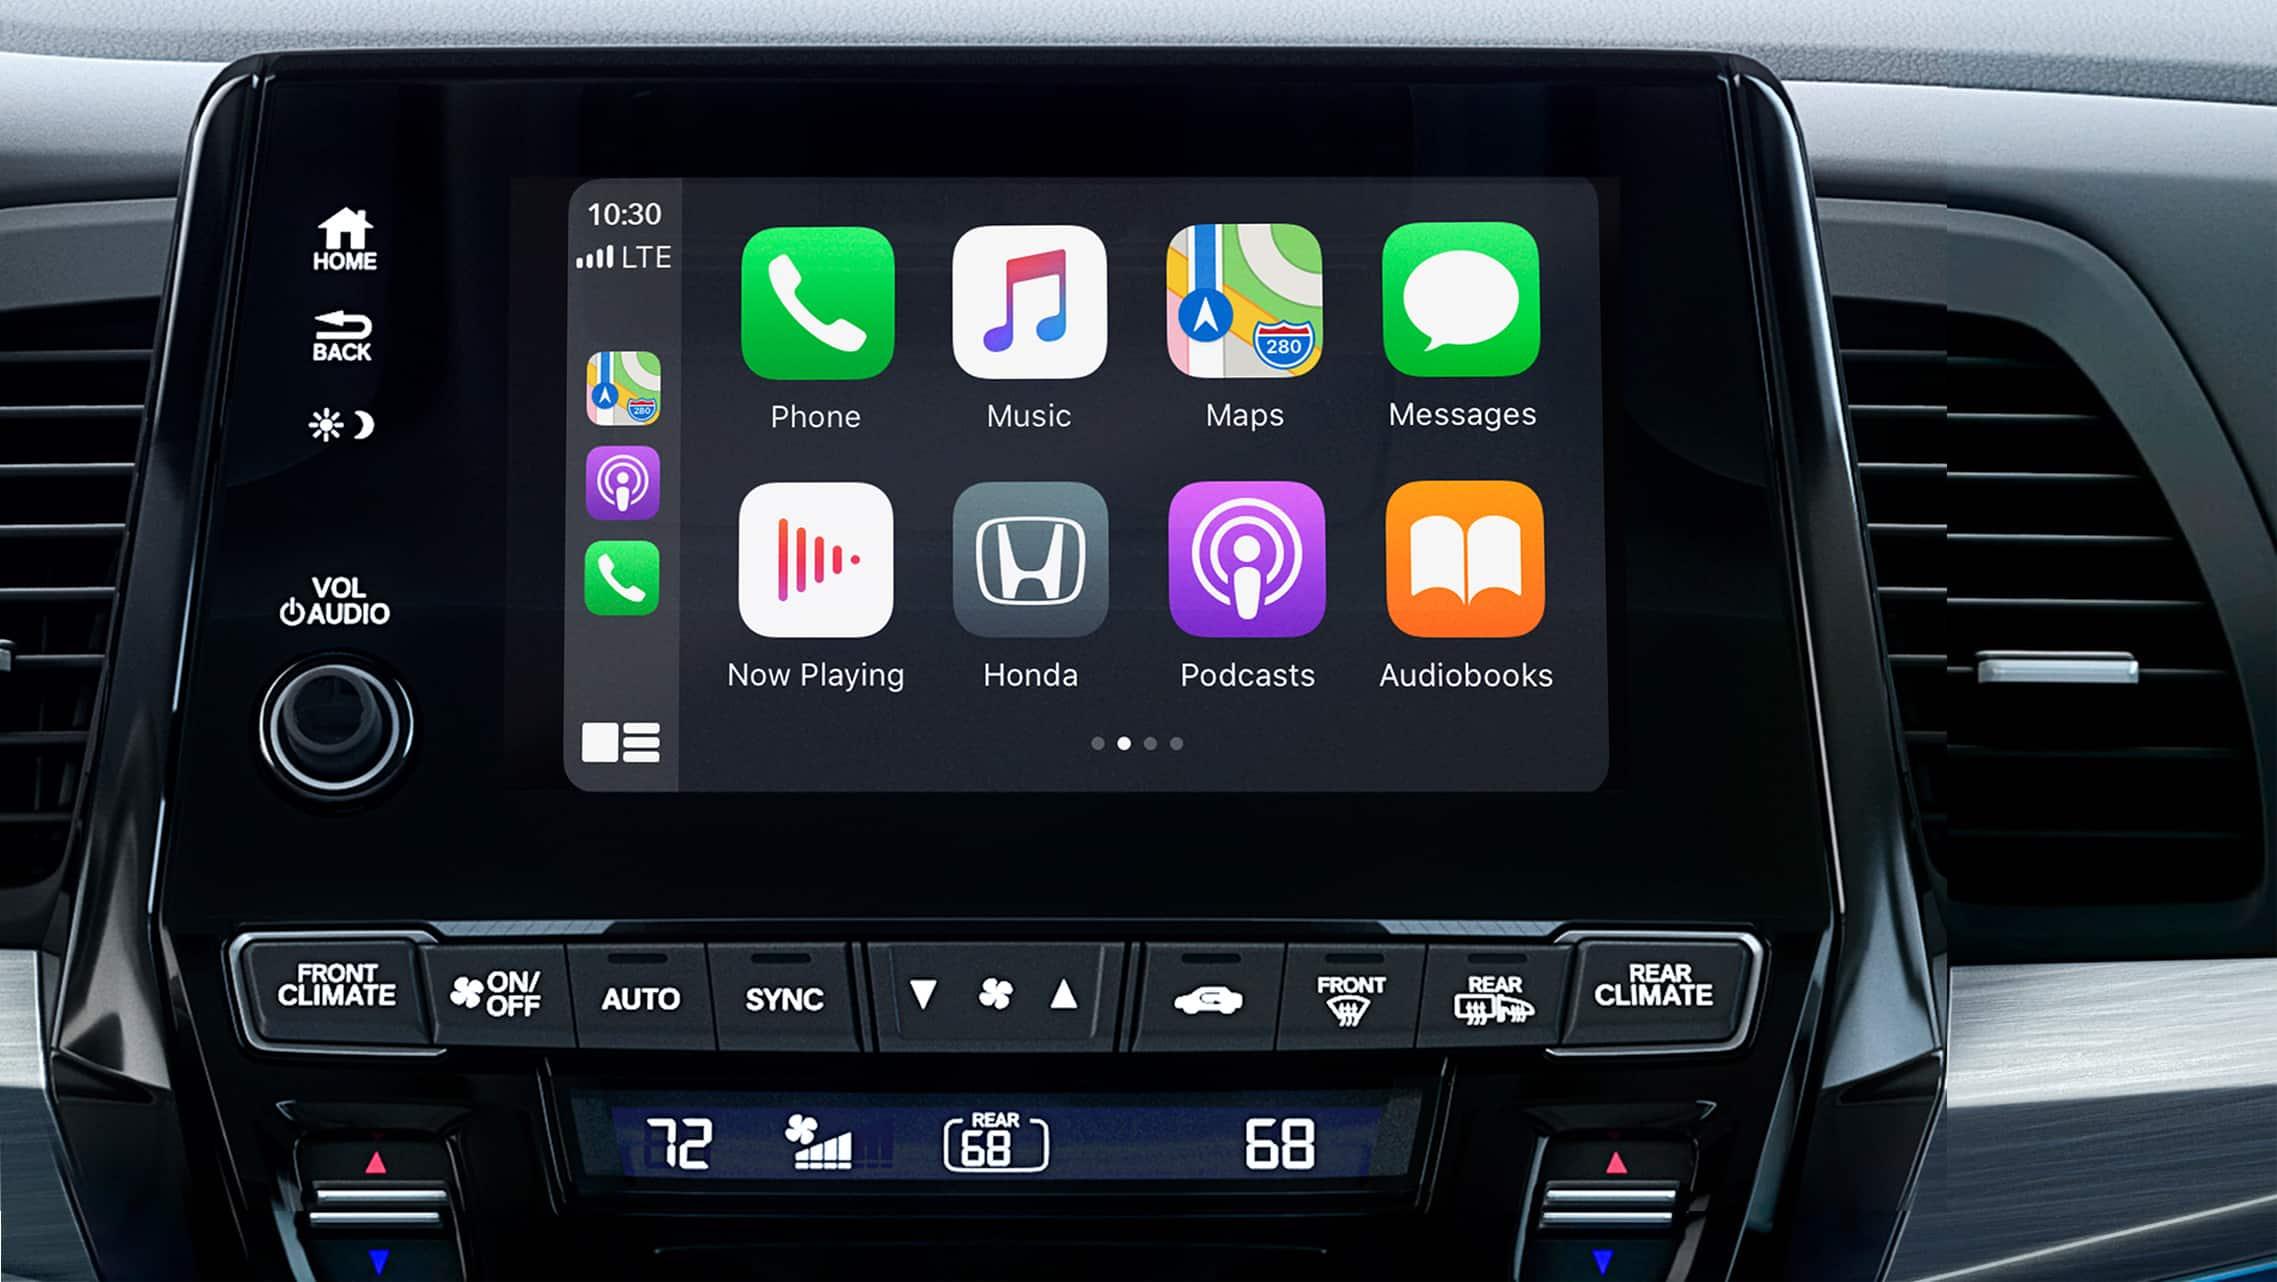 2021 honda odyssey – the fun family minivan  honda